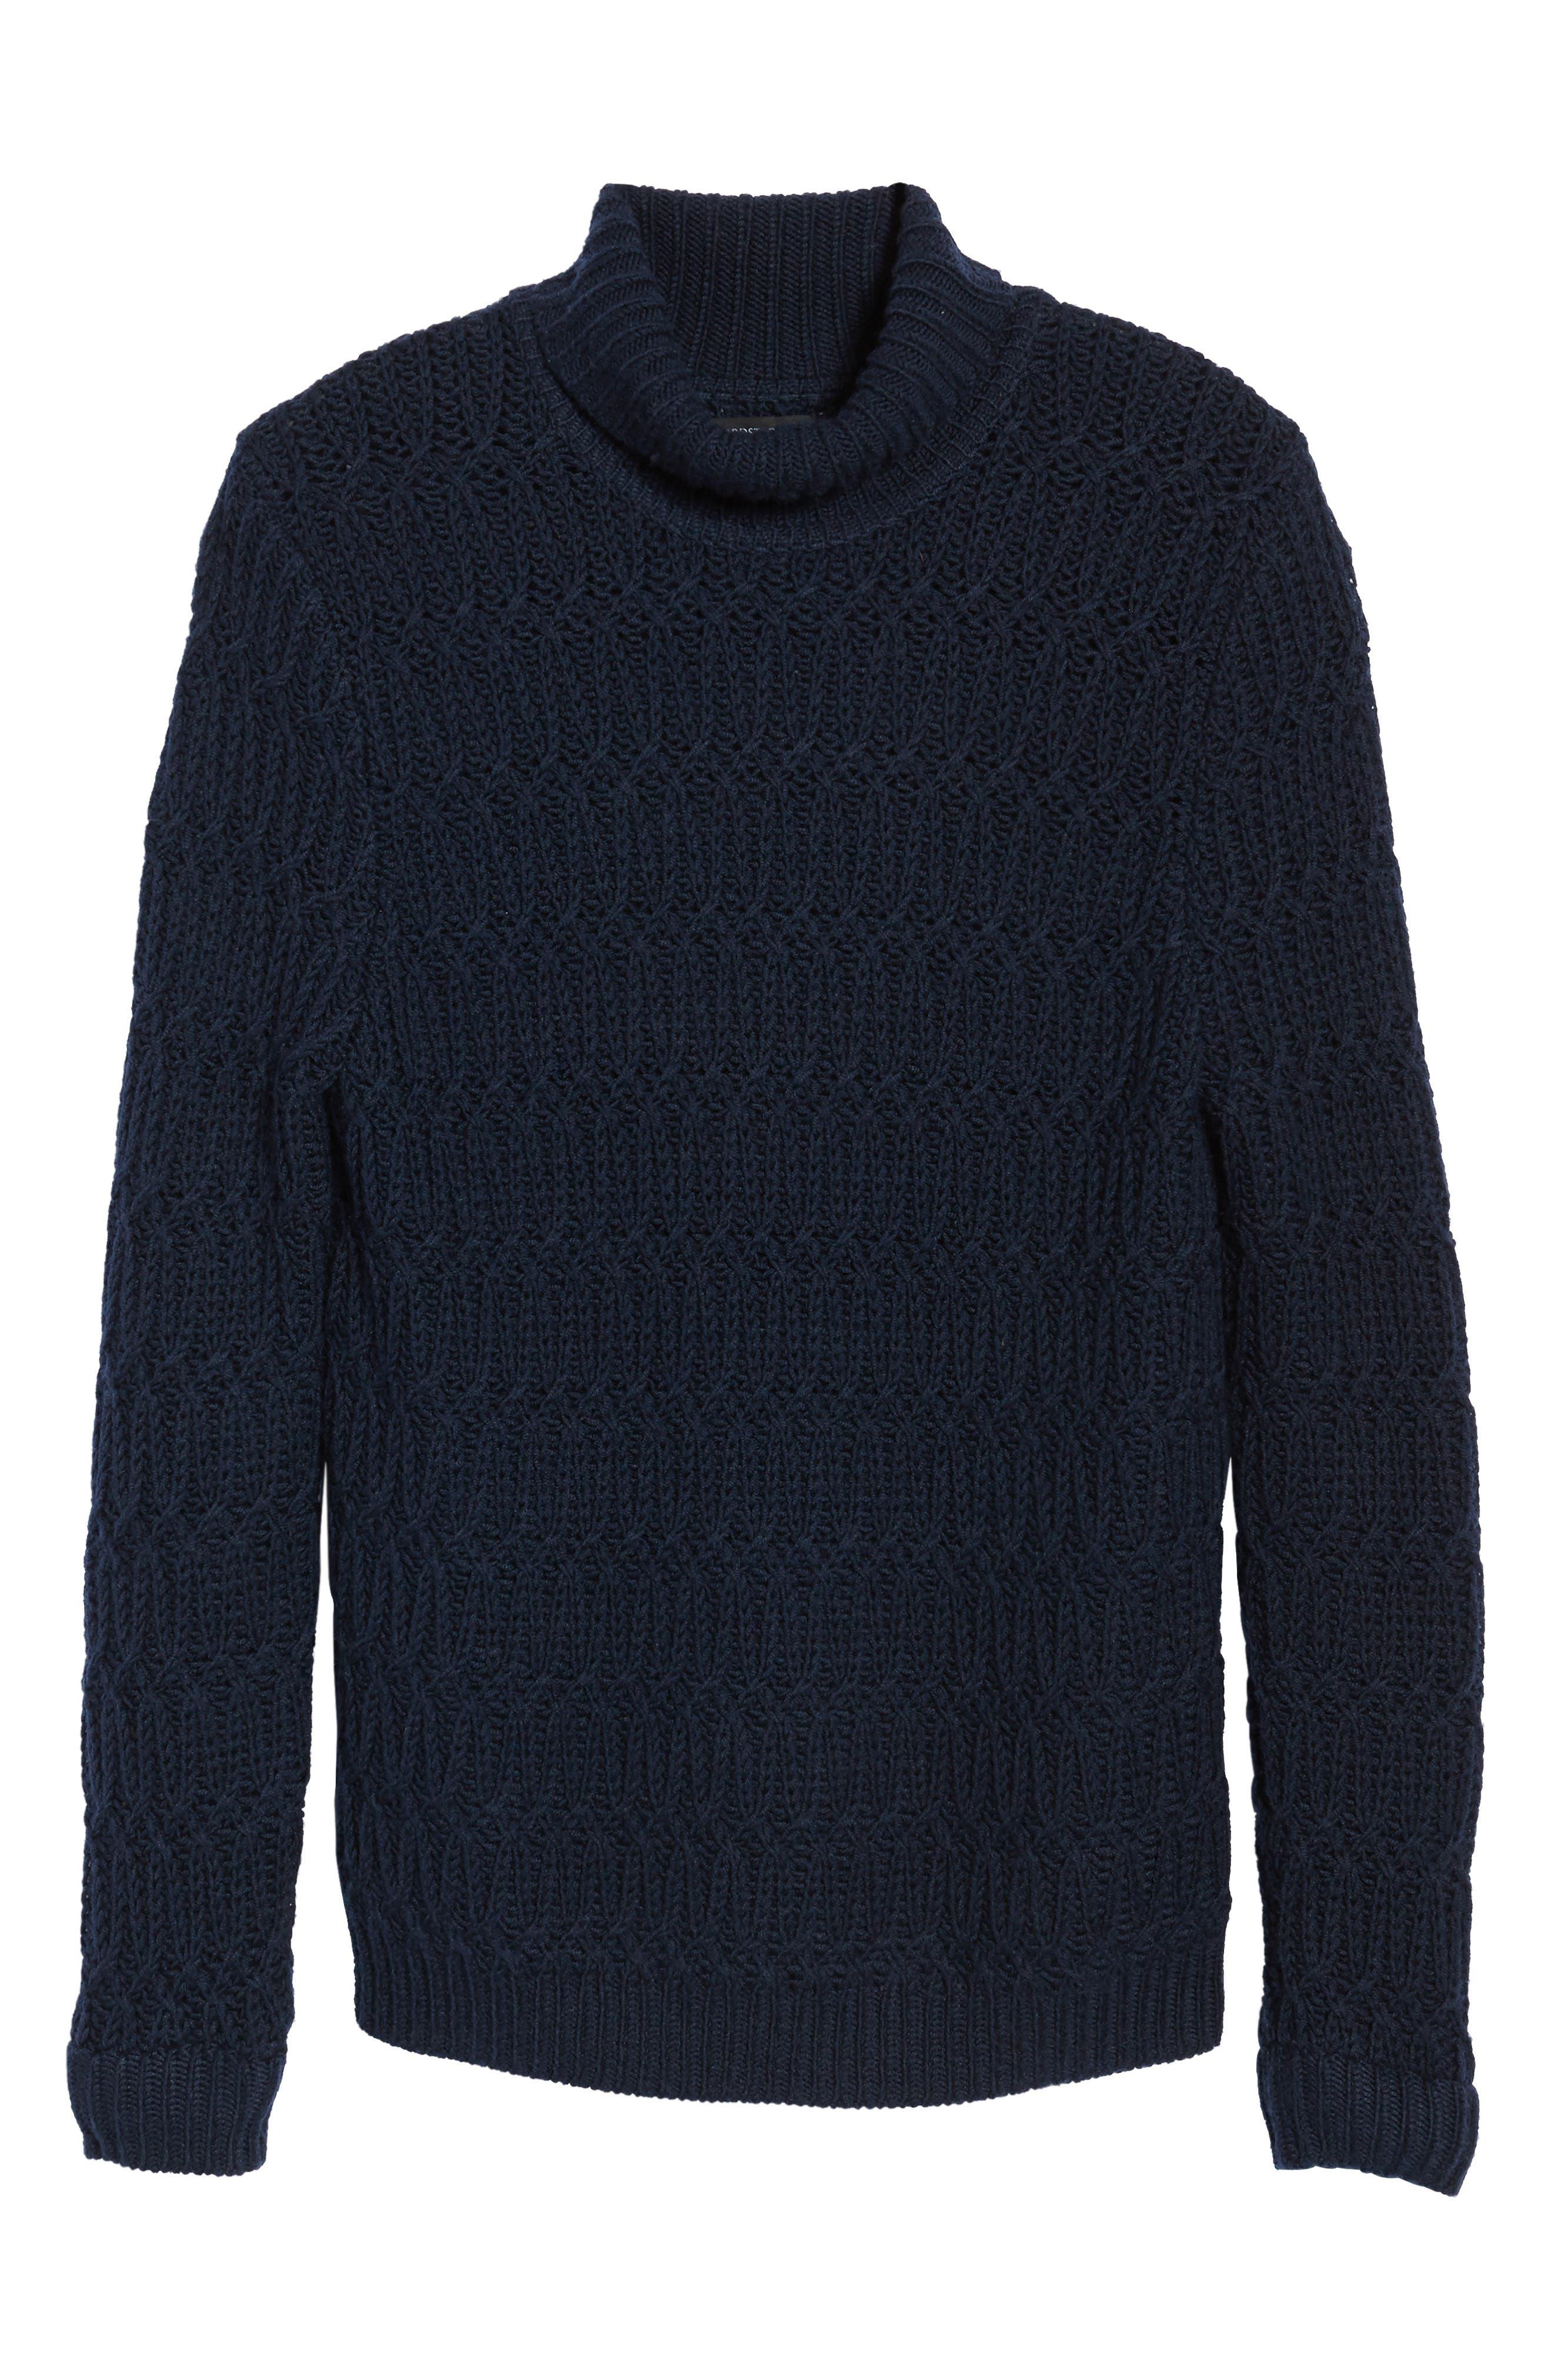 Chunky Turtleneck Sweater,                             Alternate thumbnail 8, color,                             Navy Iris